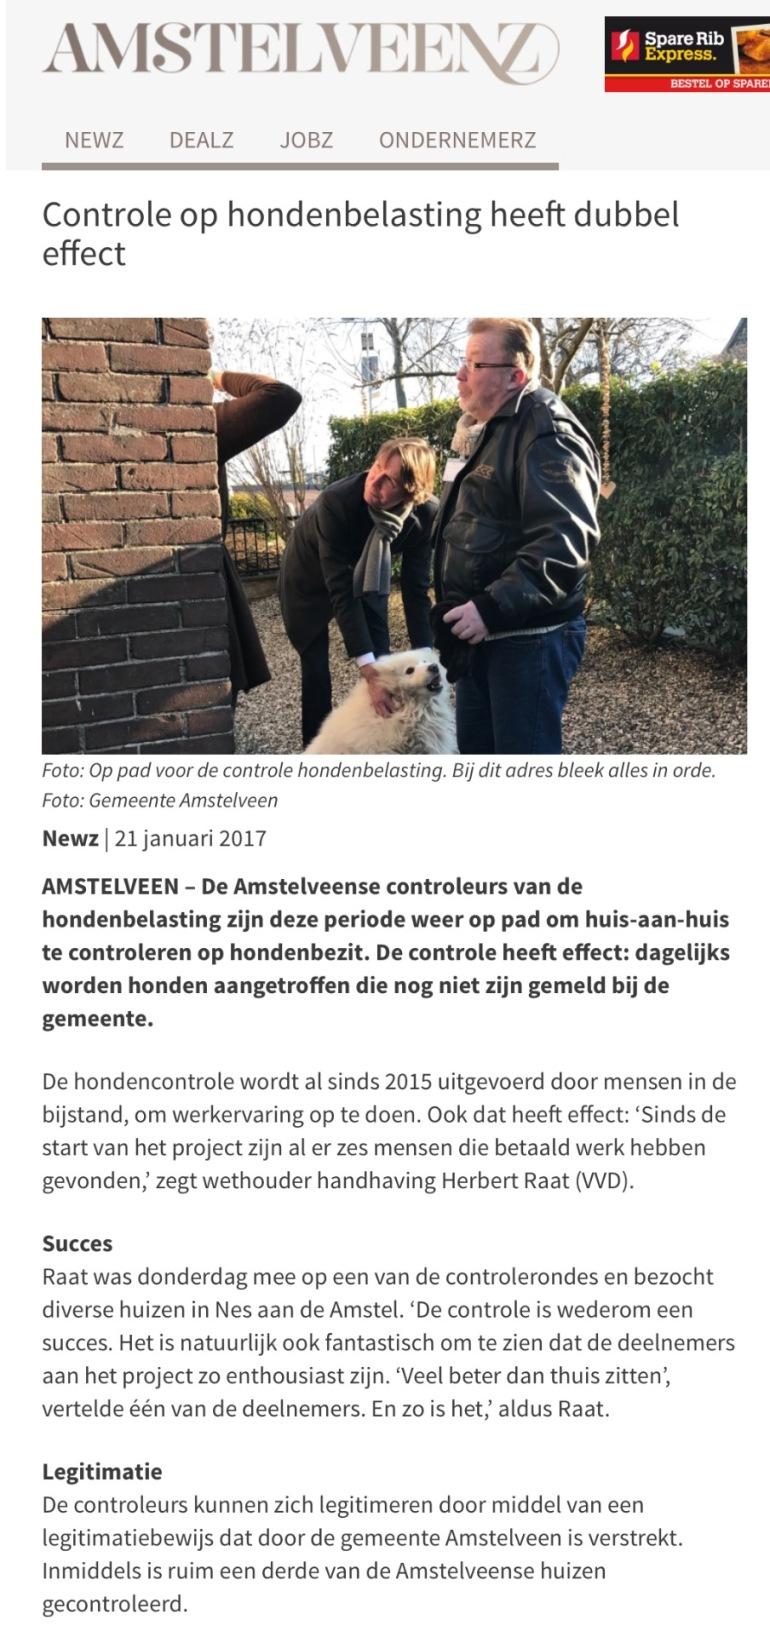 2017-21`-1 Amstelveenz over controle hondenbelasting